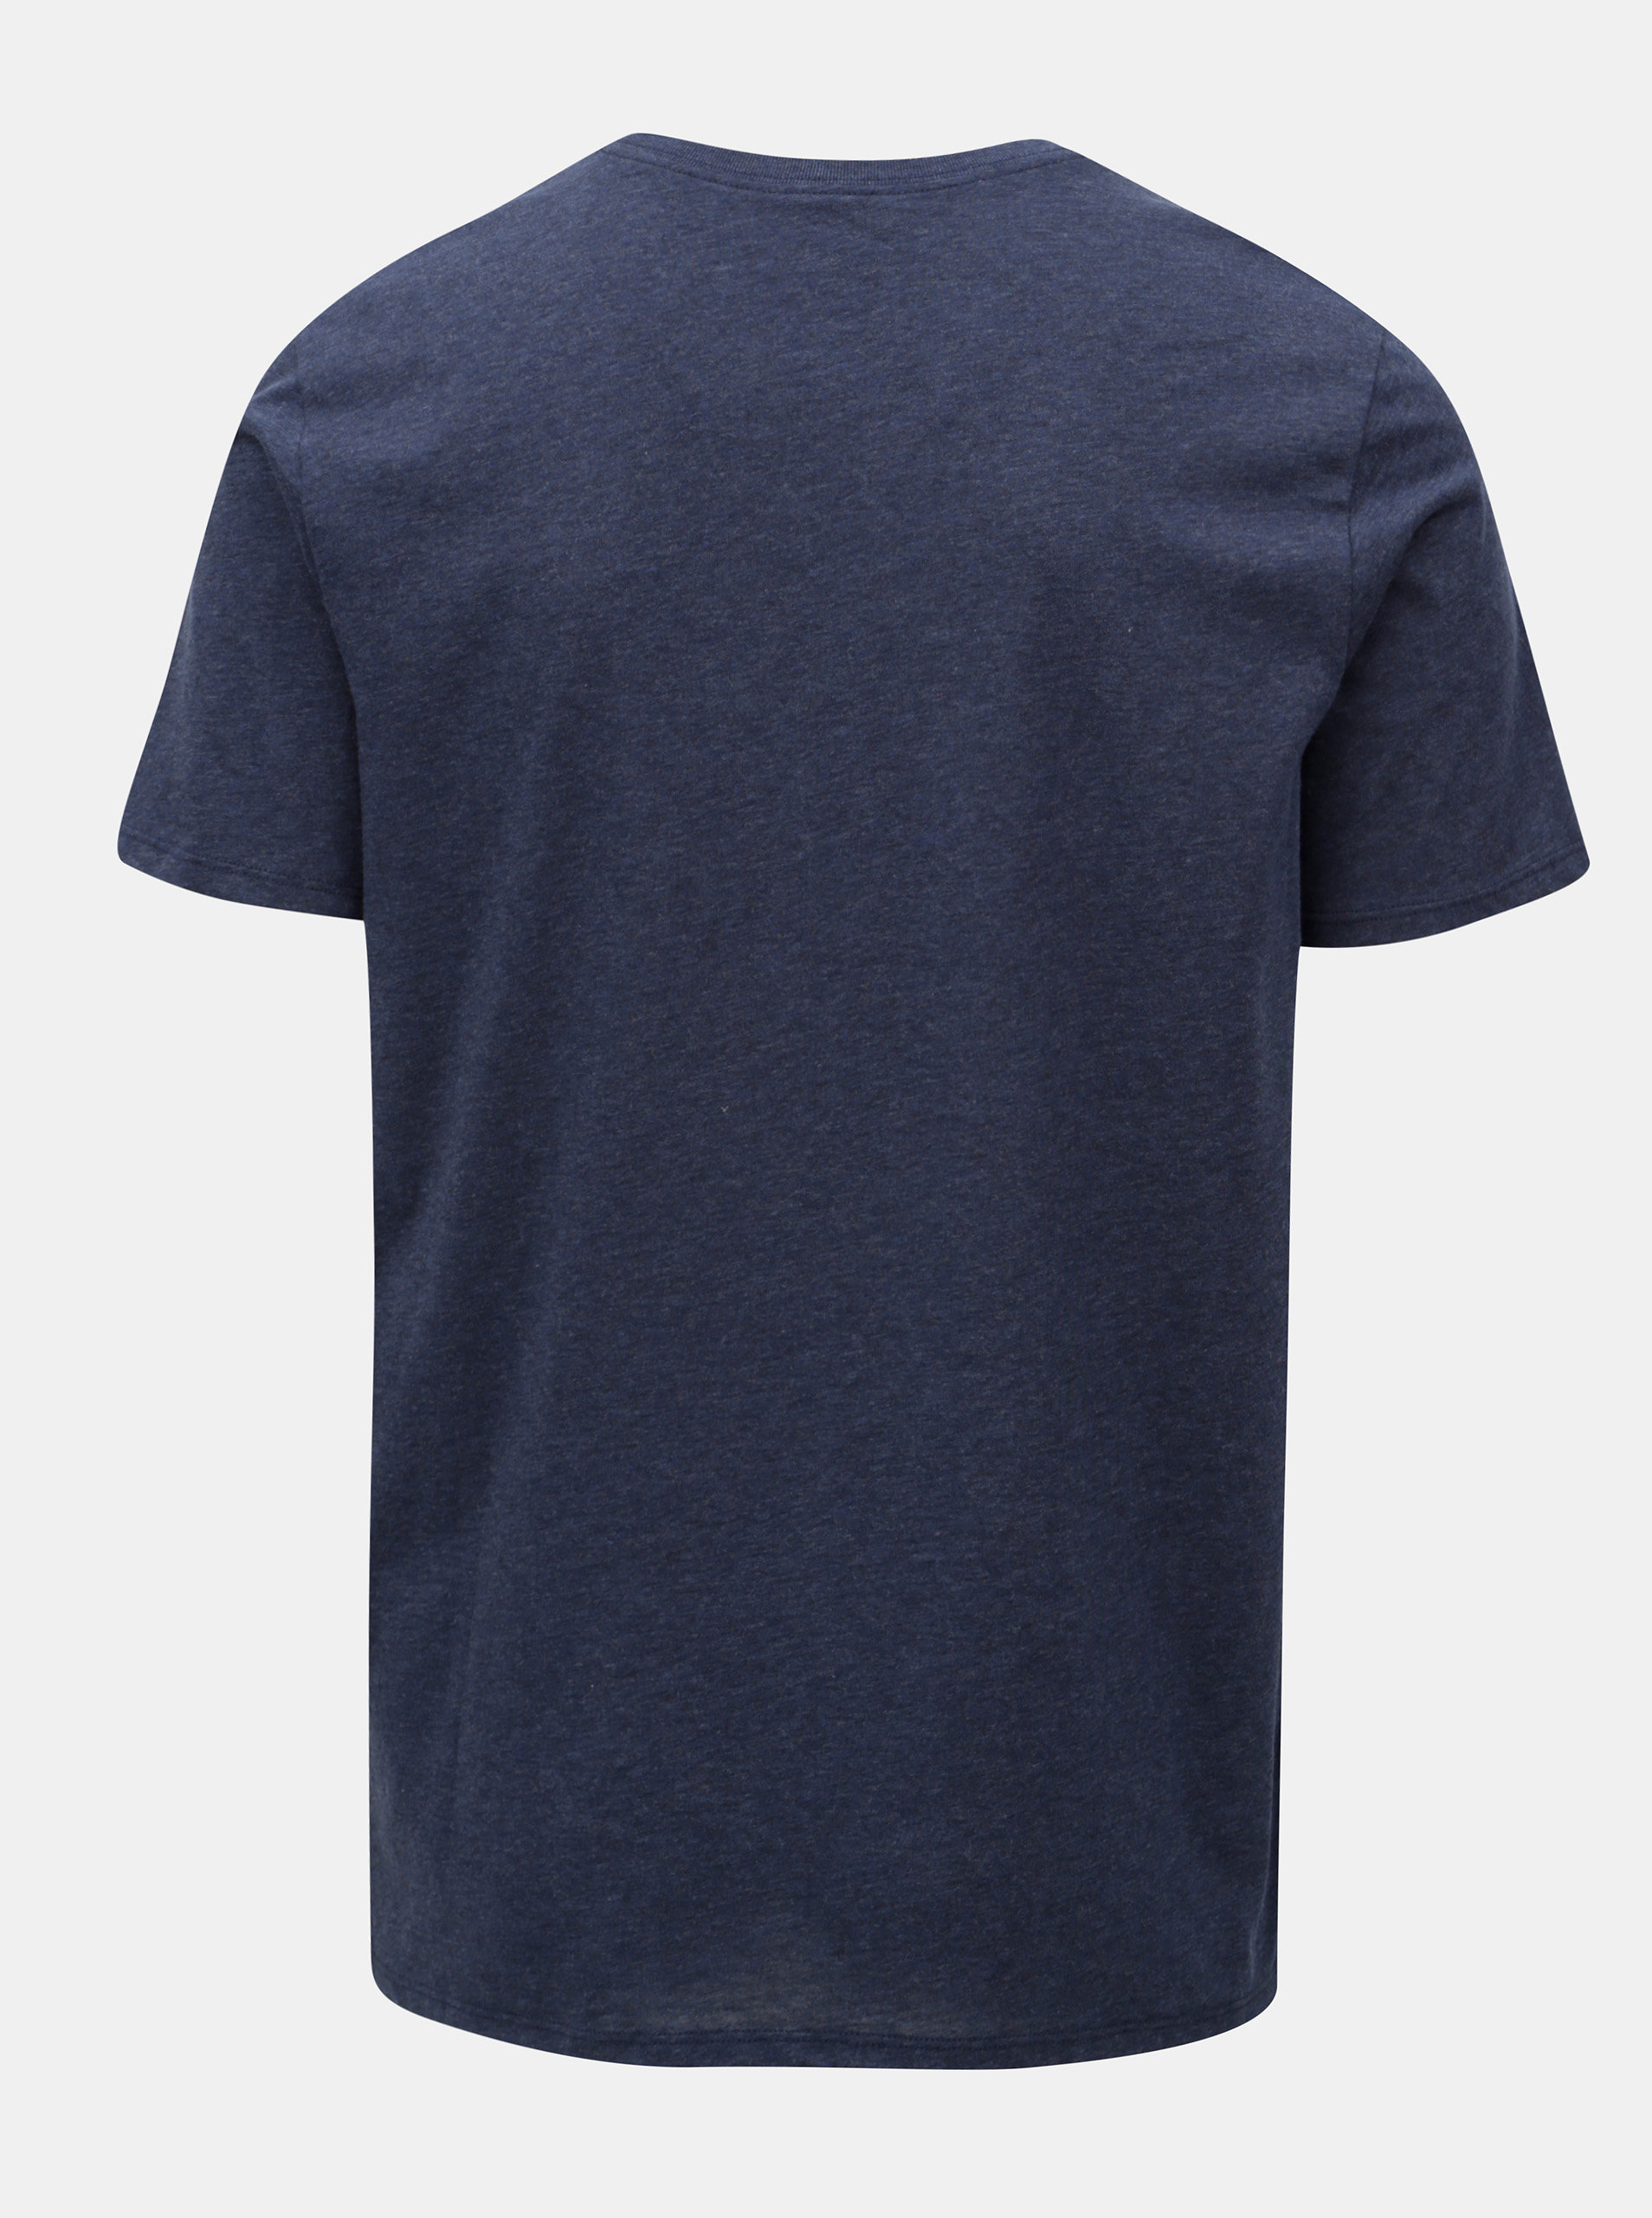 c7b8b8dc4ad1 Tmavomodré pánske funkčné tričko Nike Block Camo ...